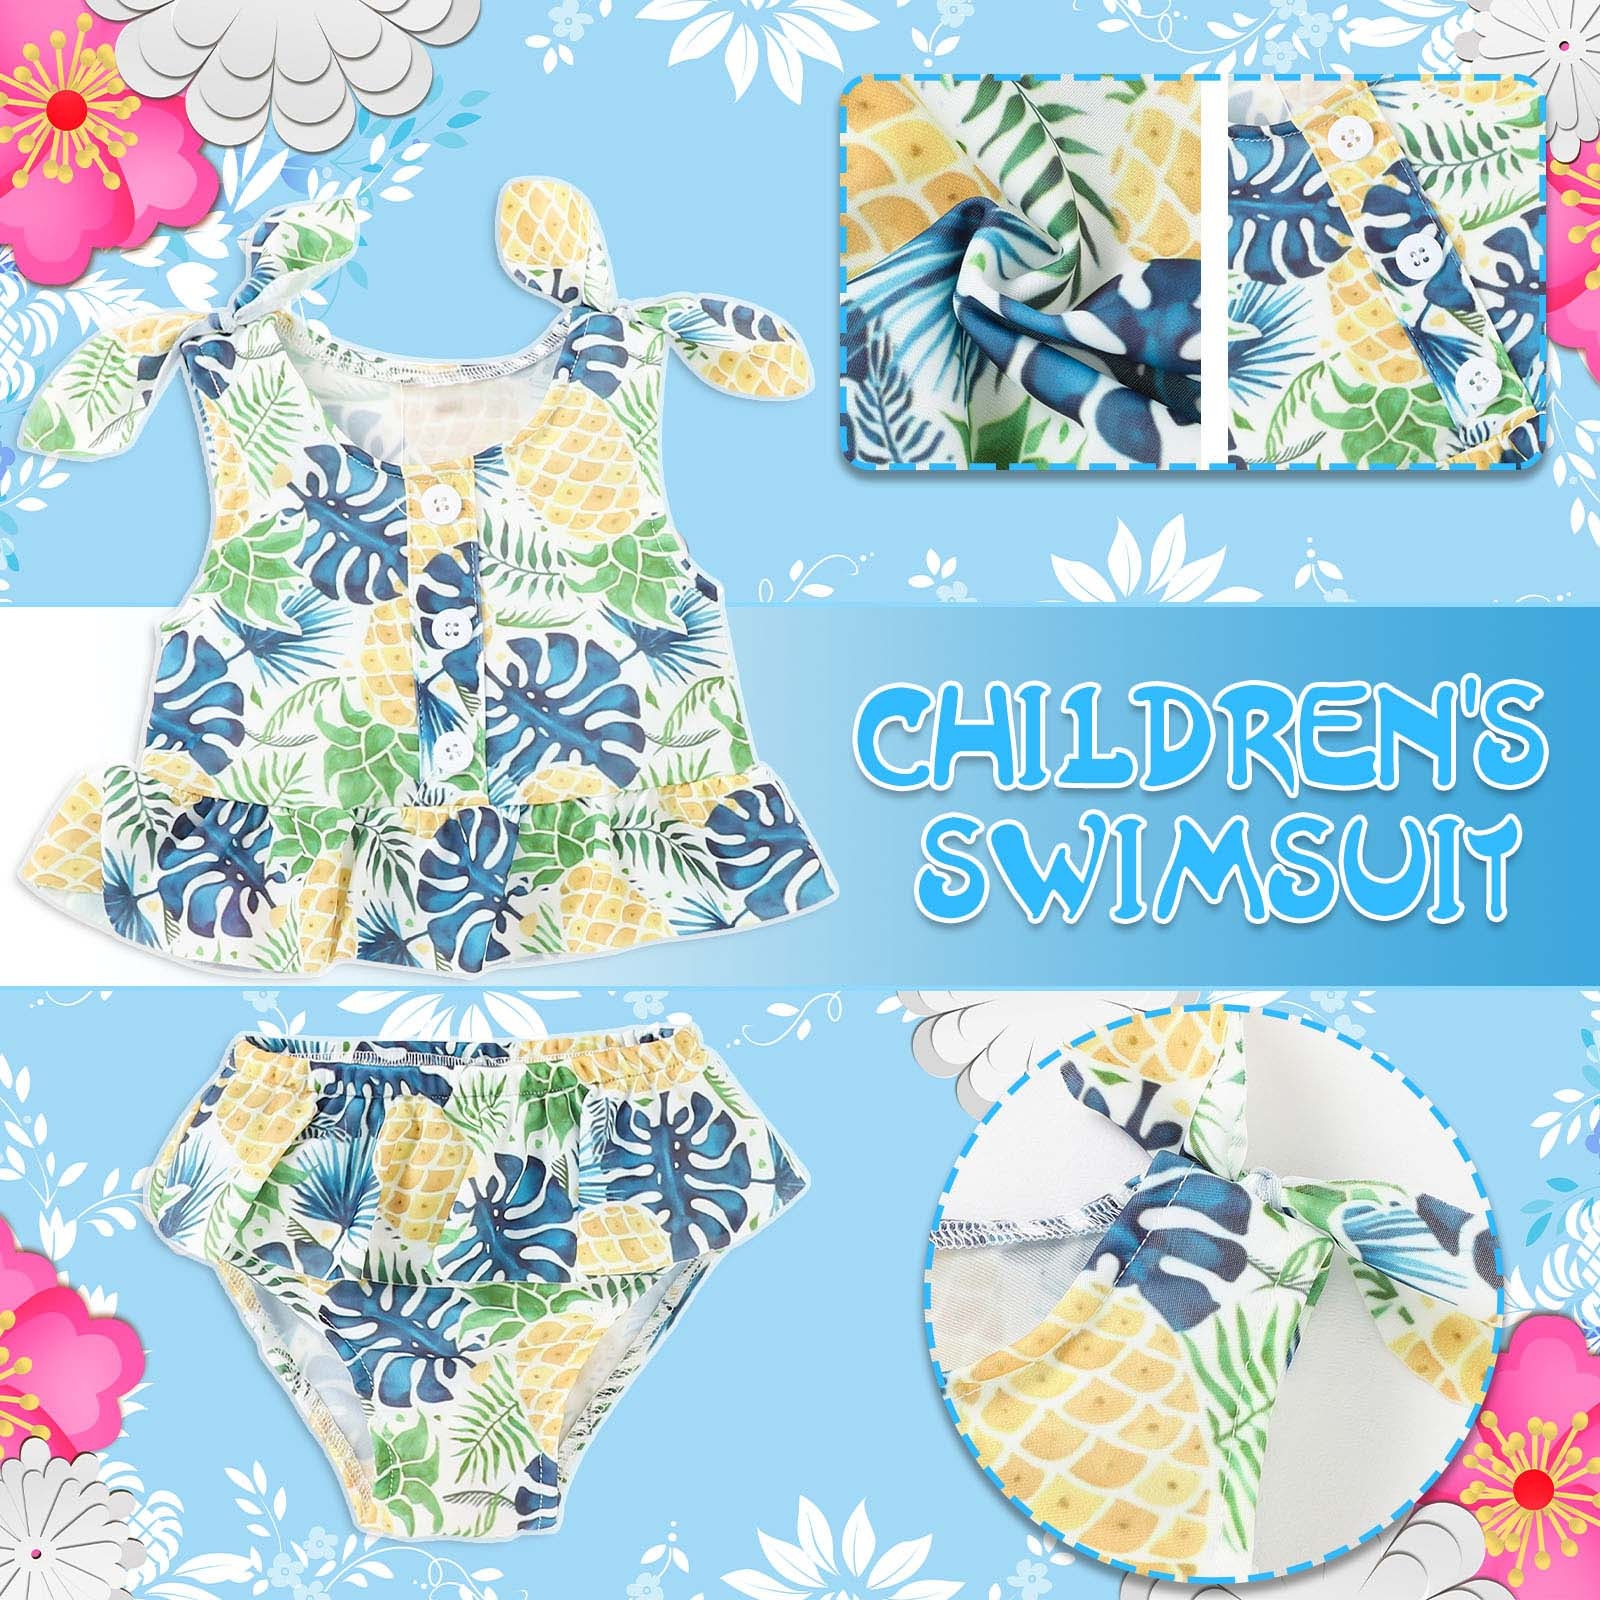 Girls swimwear summer Toddler Girls Baby Summer Pineapple Leaf Print Suspender Swimsuit купальник 2021 new  bañador niña